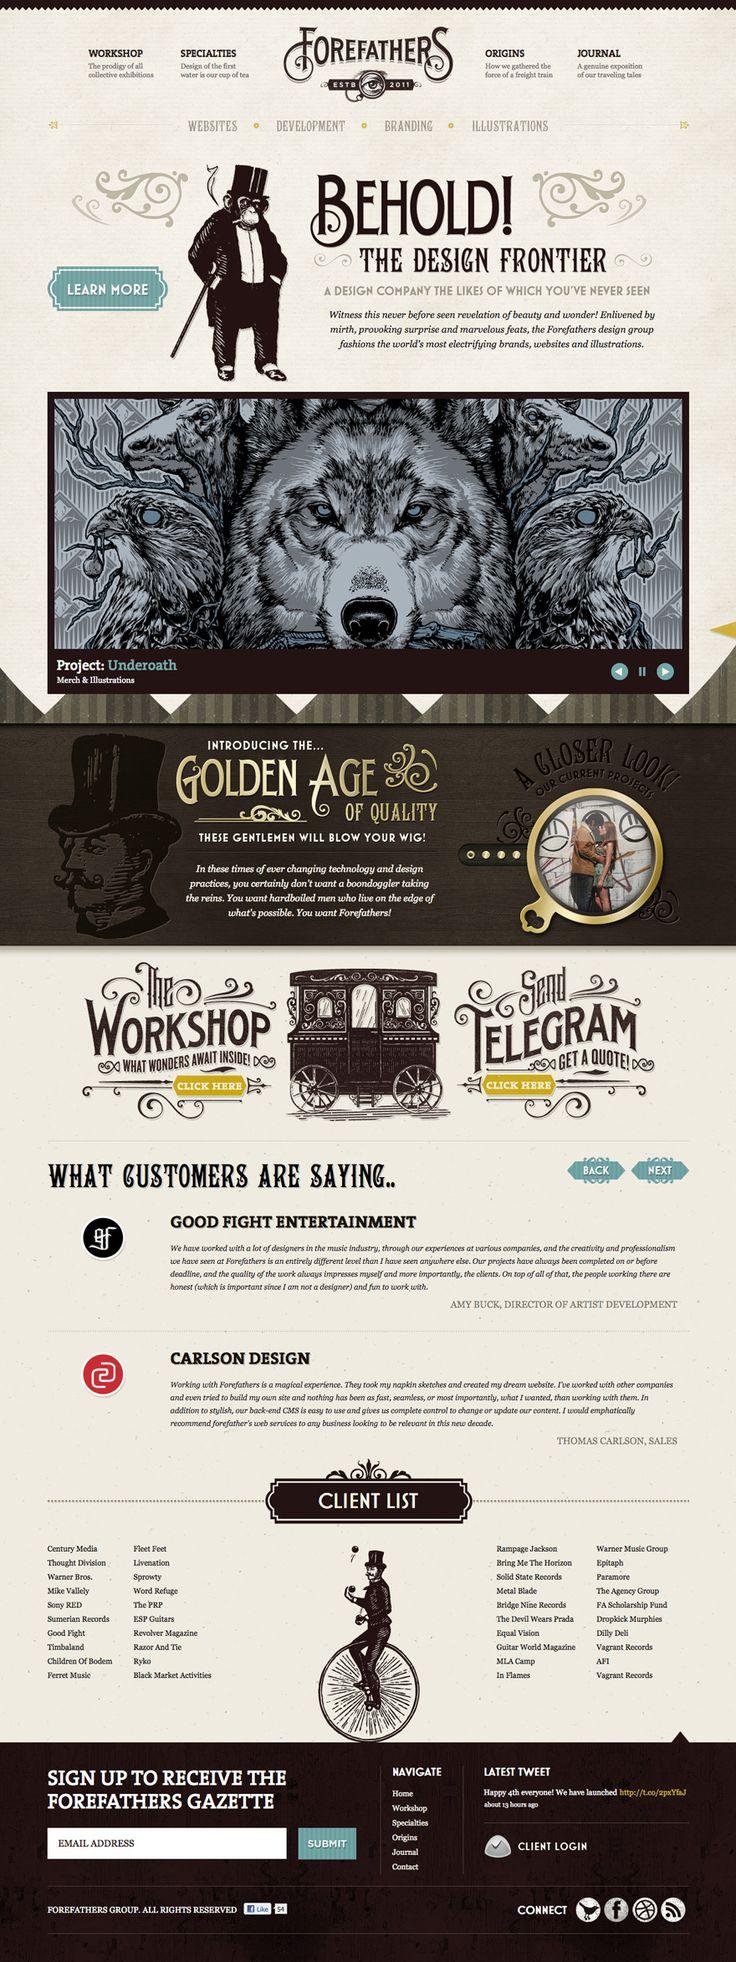 Unique Web Design, Forefathers #WebDesign #Design (http://www.pinterest.com/aldenchong/)